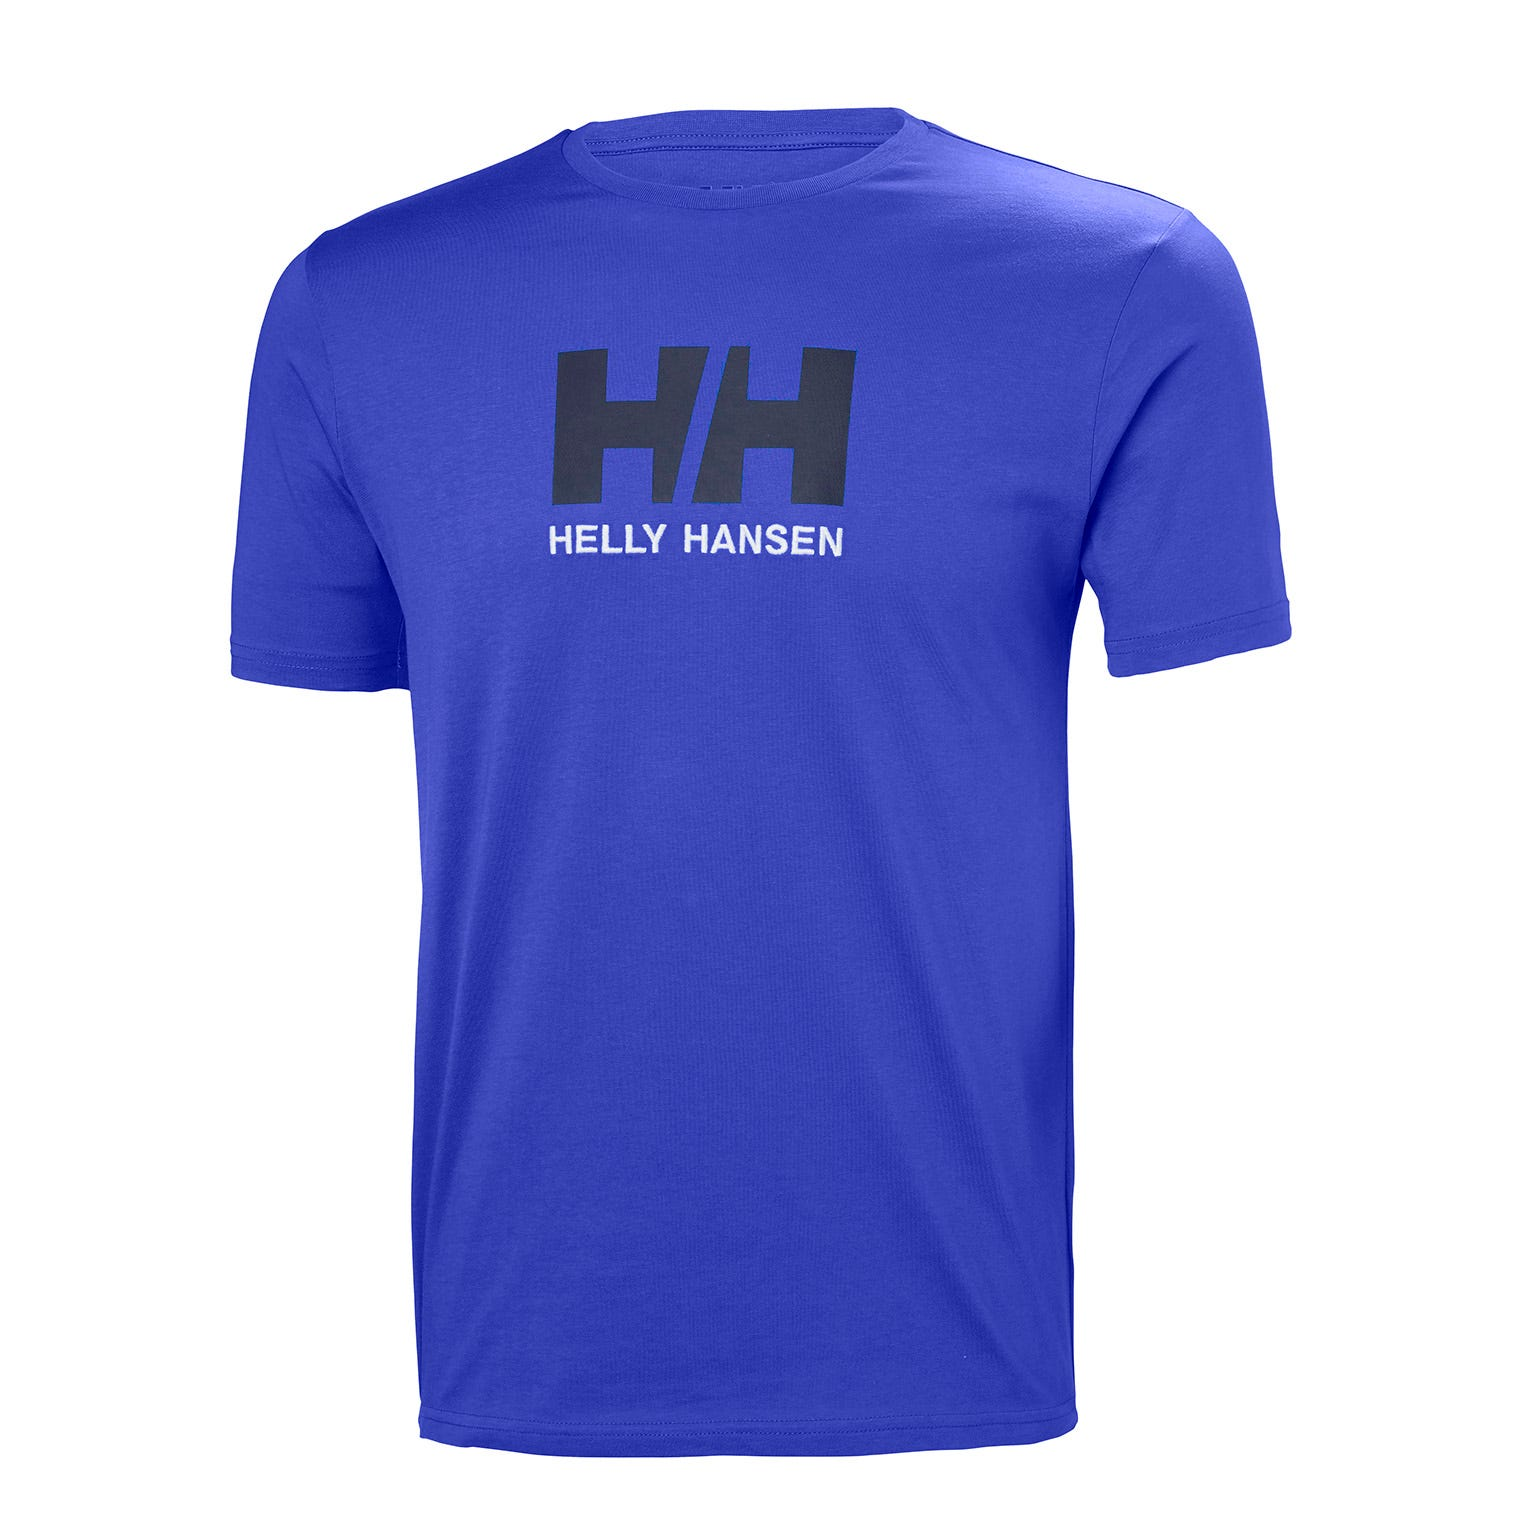 Helly Hansen Mens Hh Logo Tshirt Blue Xxxxl